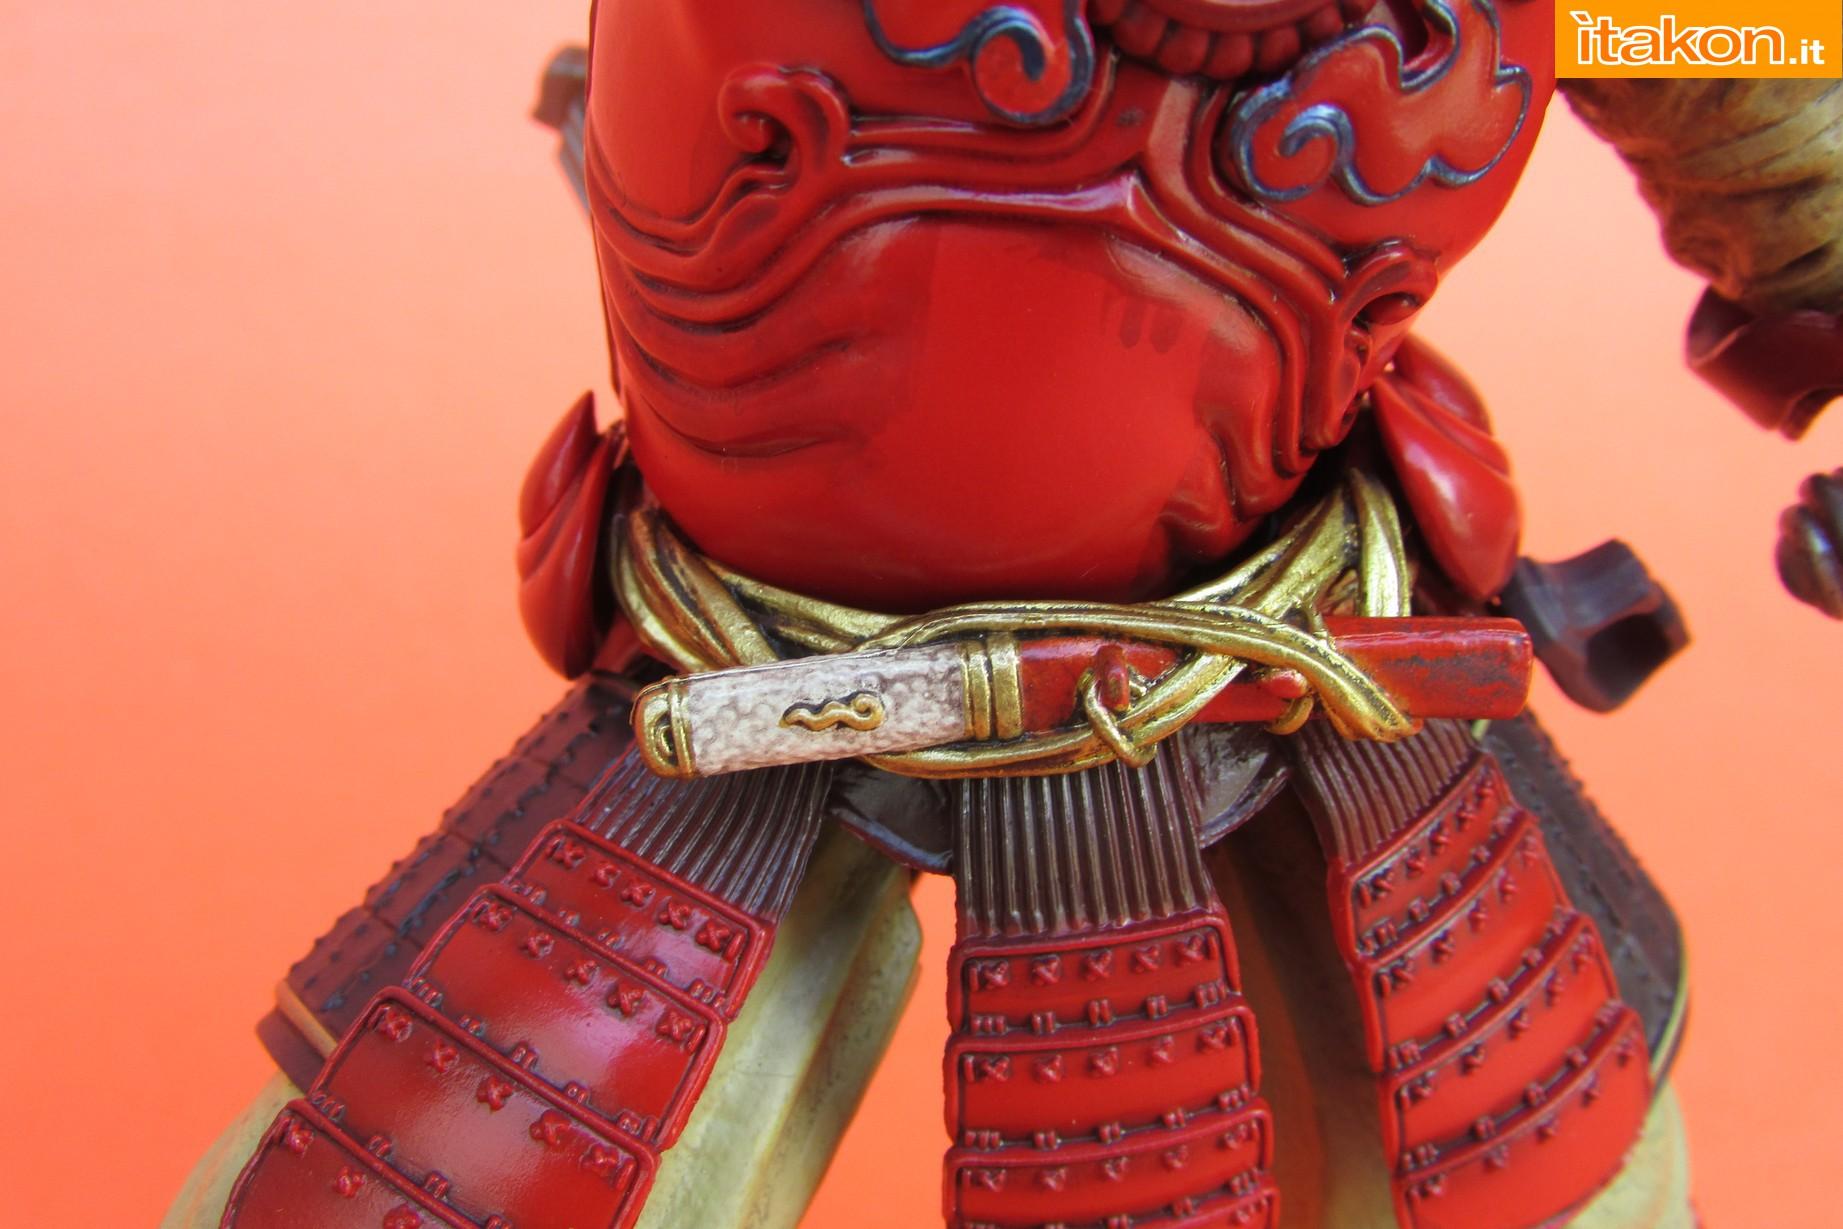 Link a Marvel Comics Koutetsu Samurai Iron Man Mark 3 Meishou MANGA REALIZATION review Bandai Itakon.it45